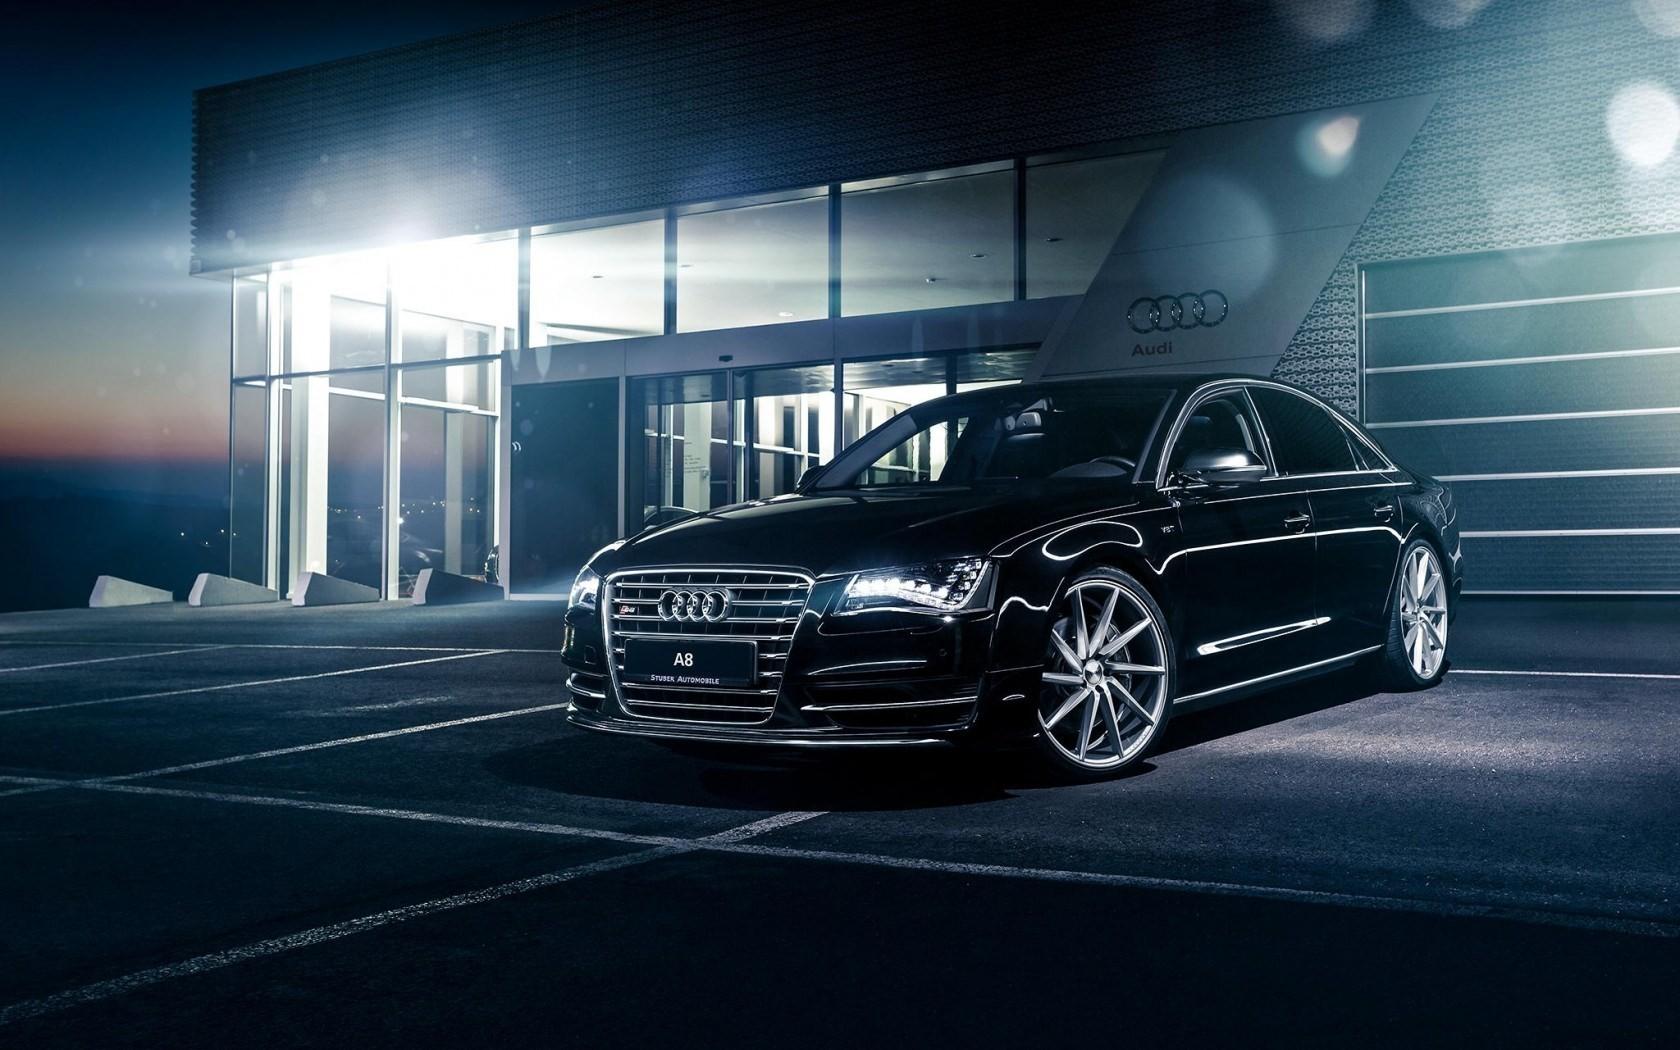 Audi A8 Wallpaper 14   [1680x1050] 1680x1050